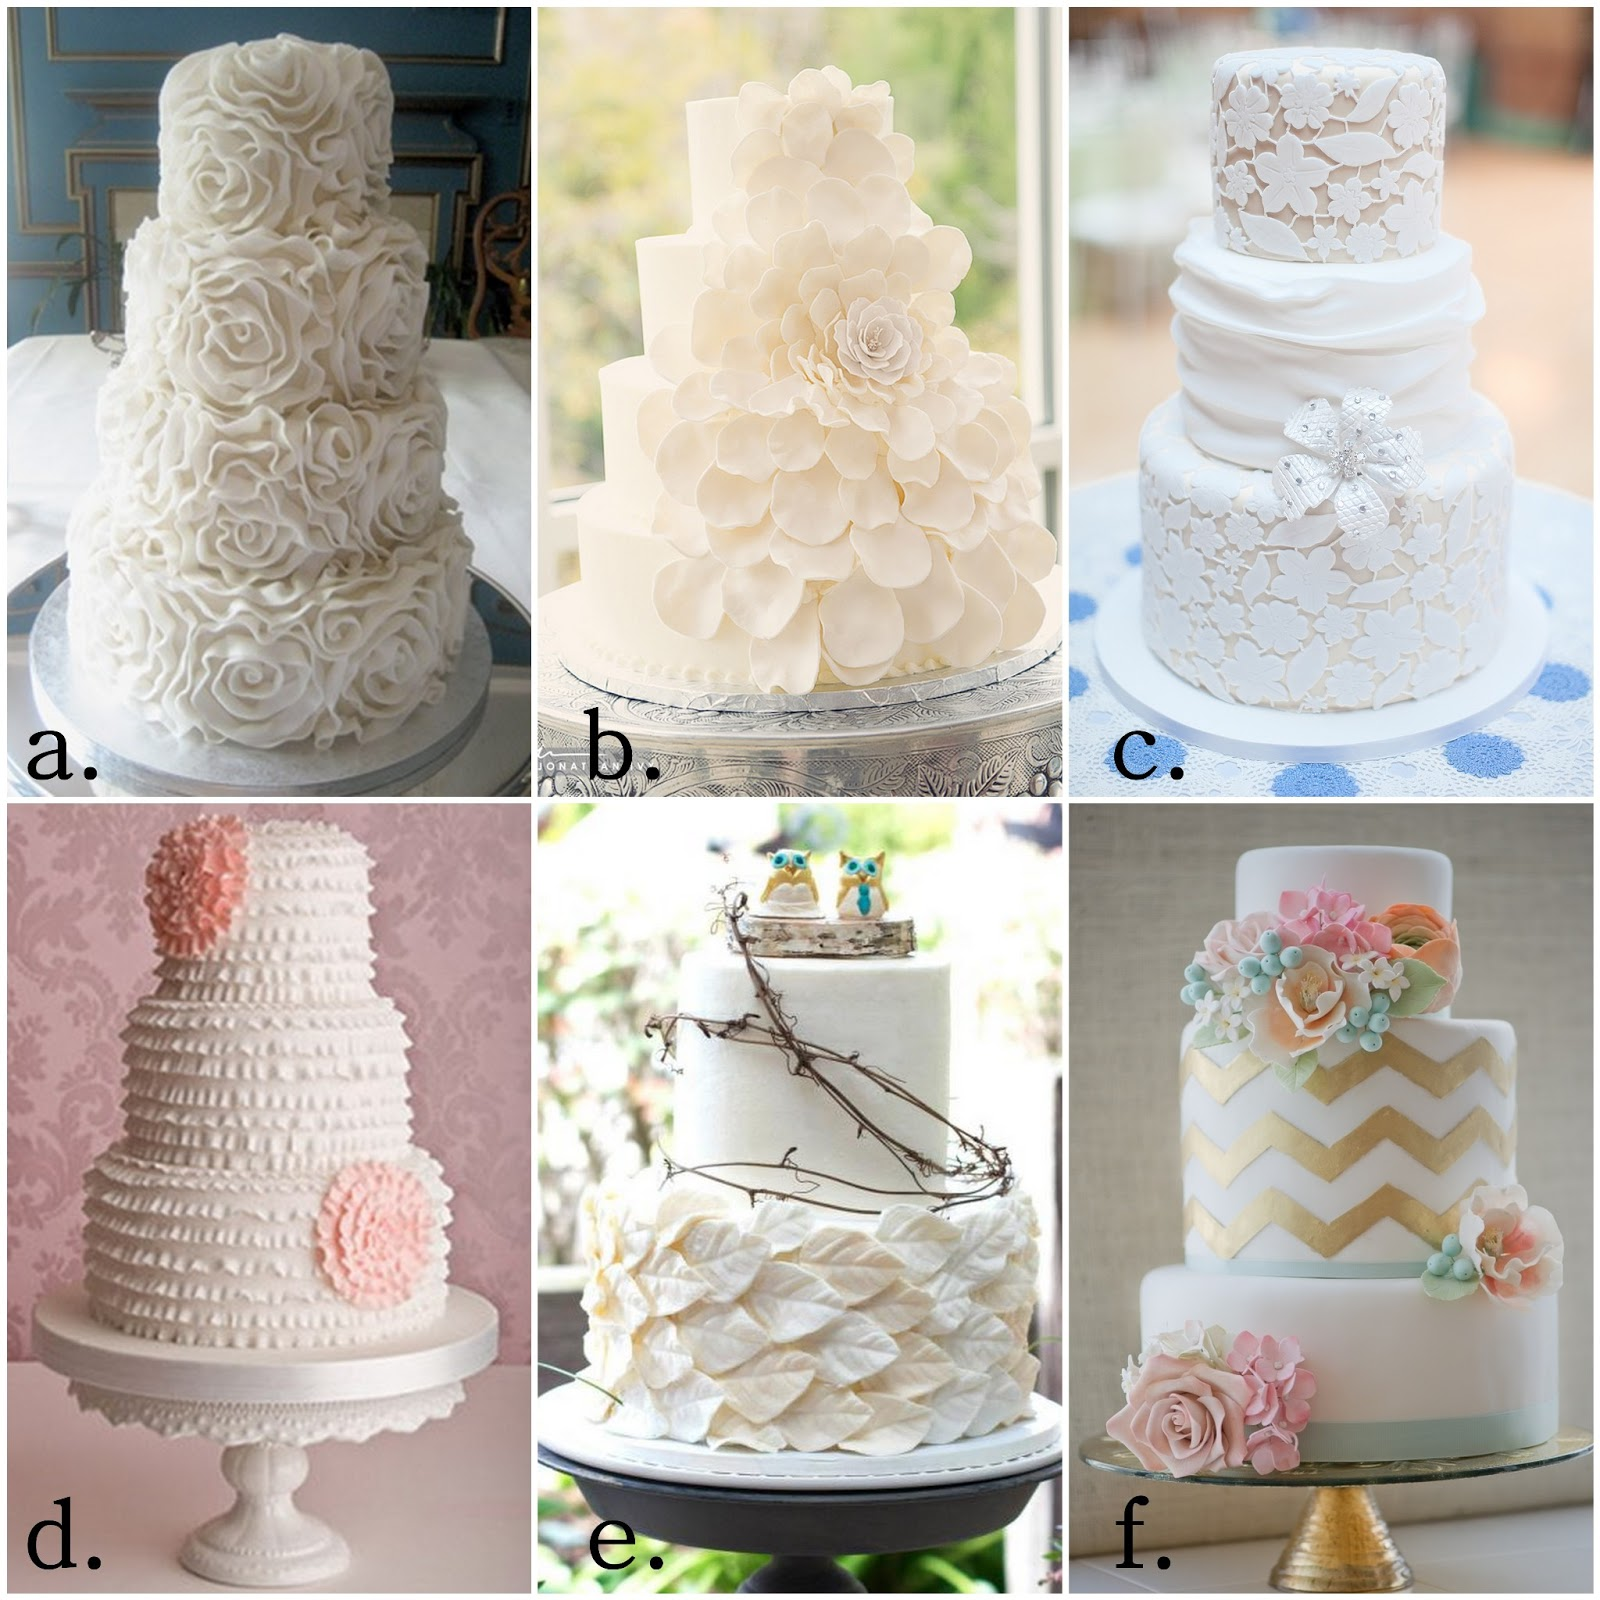 Wedding Cakes 2013 New Fresh Cute Wedding Cakes 2013